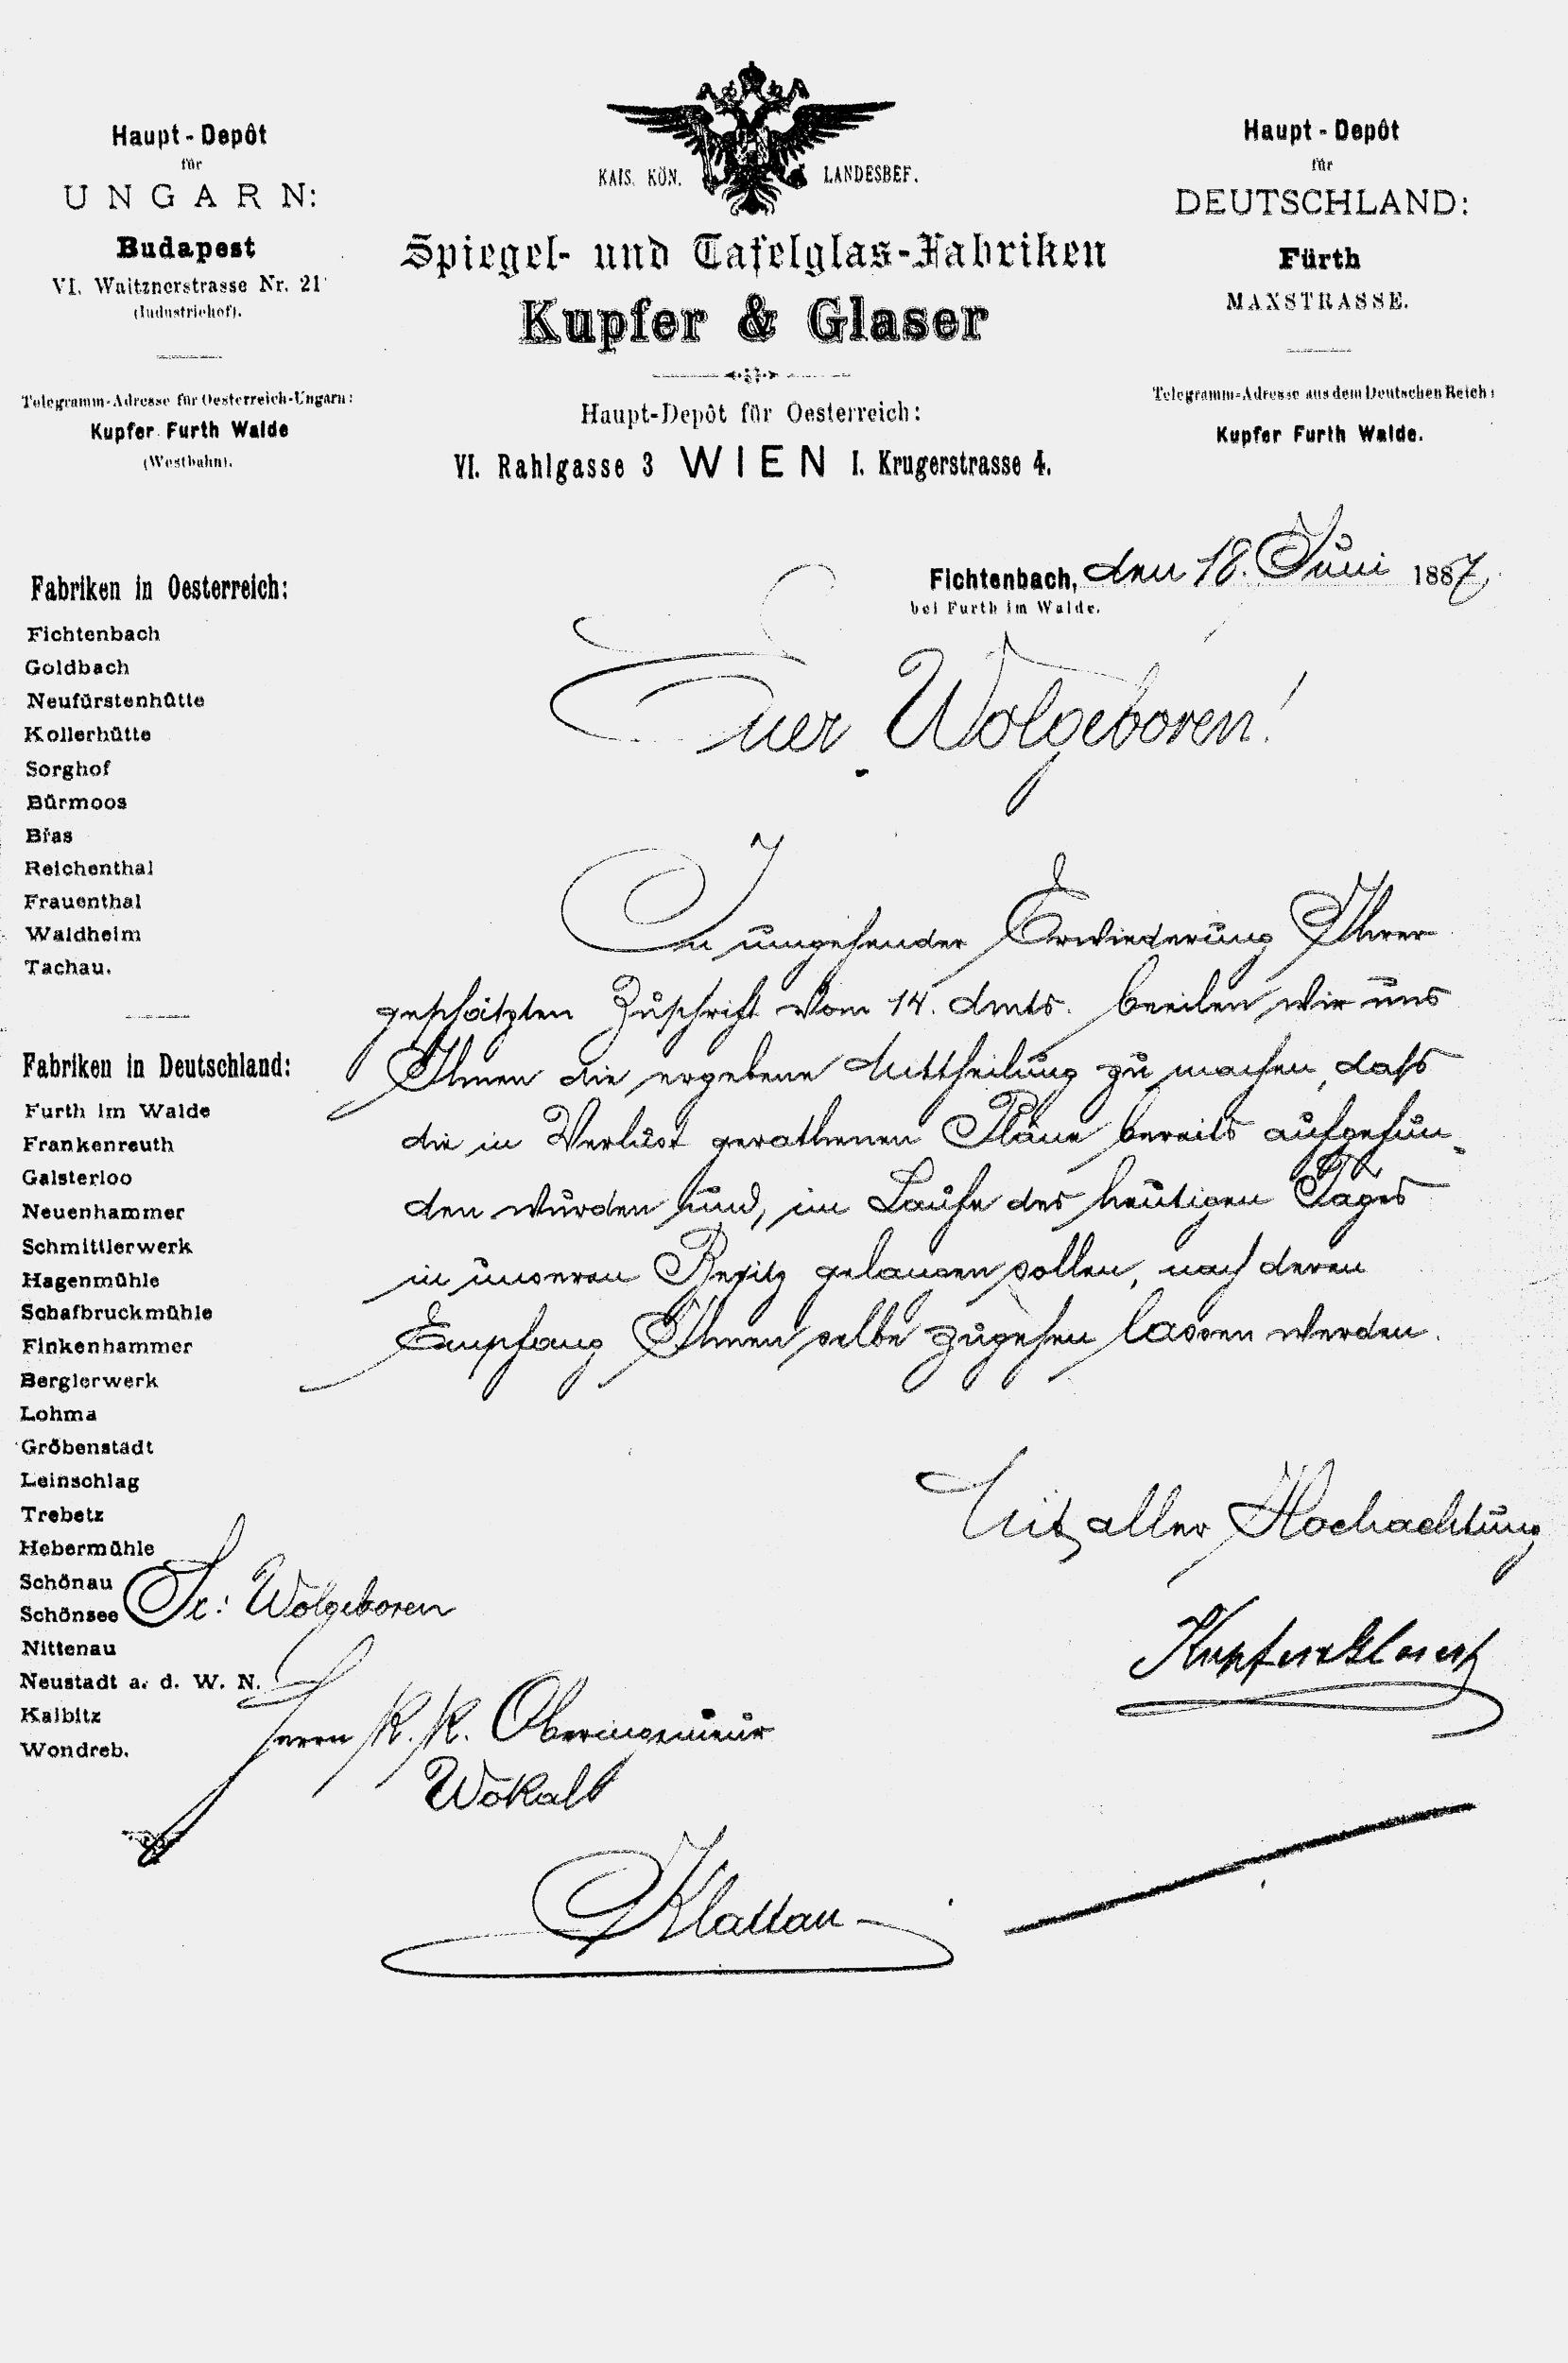 Business letter from Kupfer & Glaser, 1887